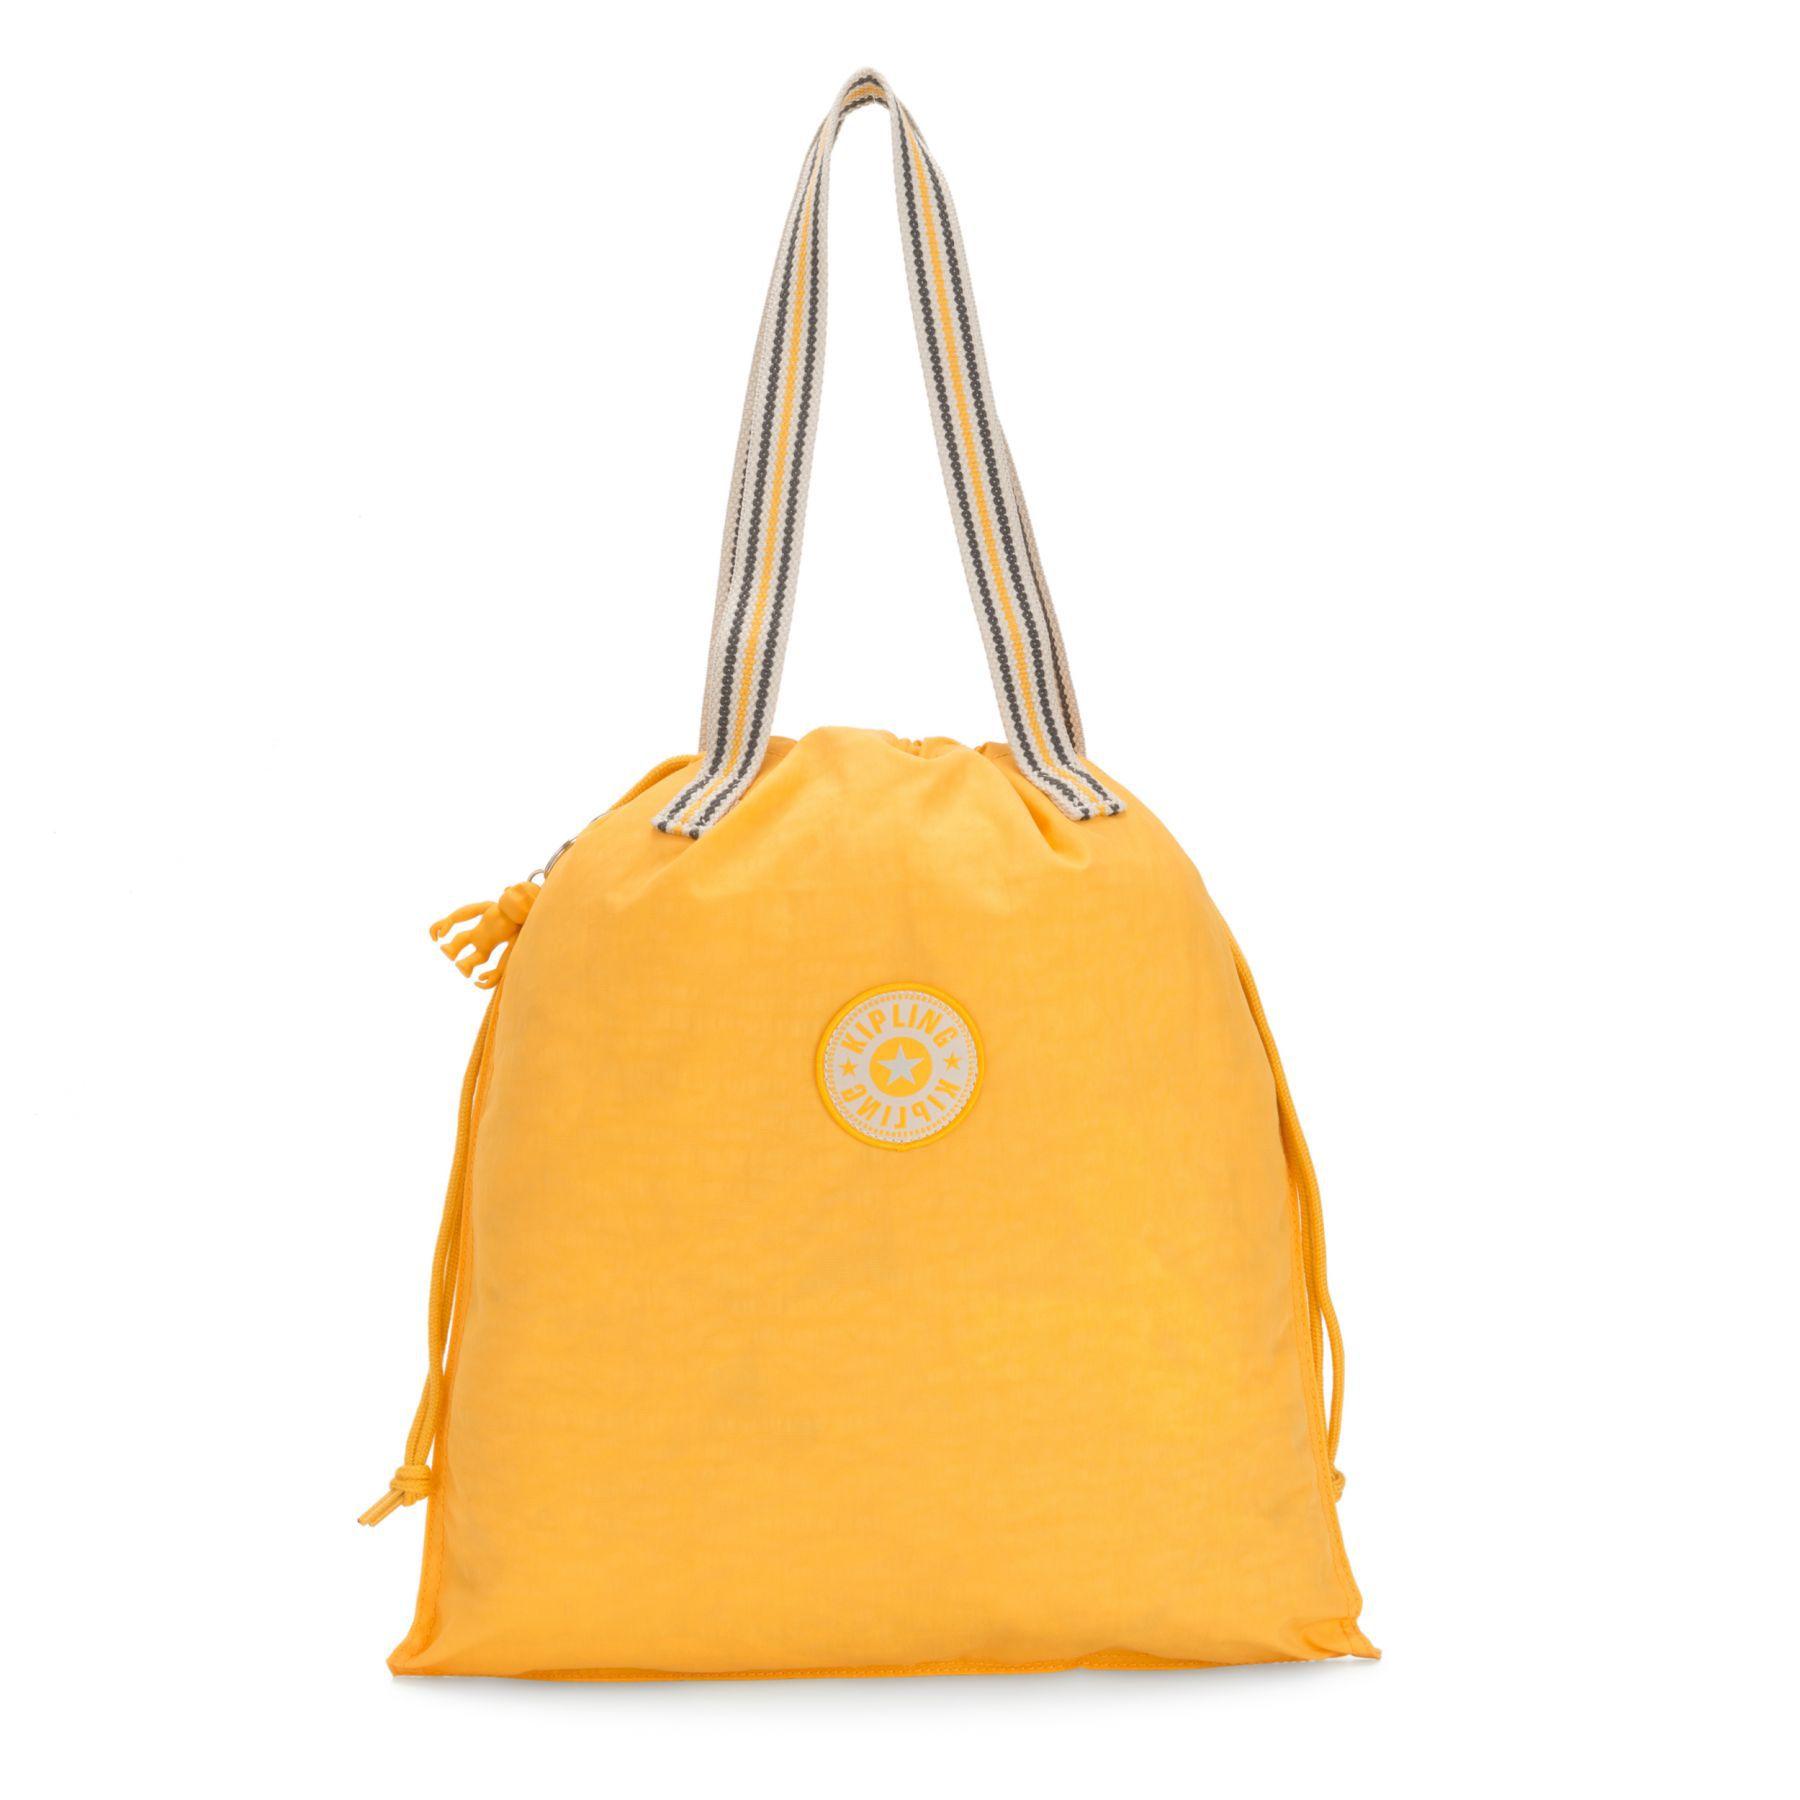 Bolsa de Ombro New Hiphurray Kipling Vivid Yellow